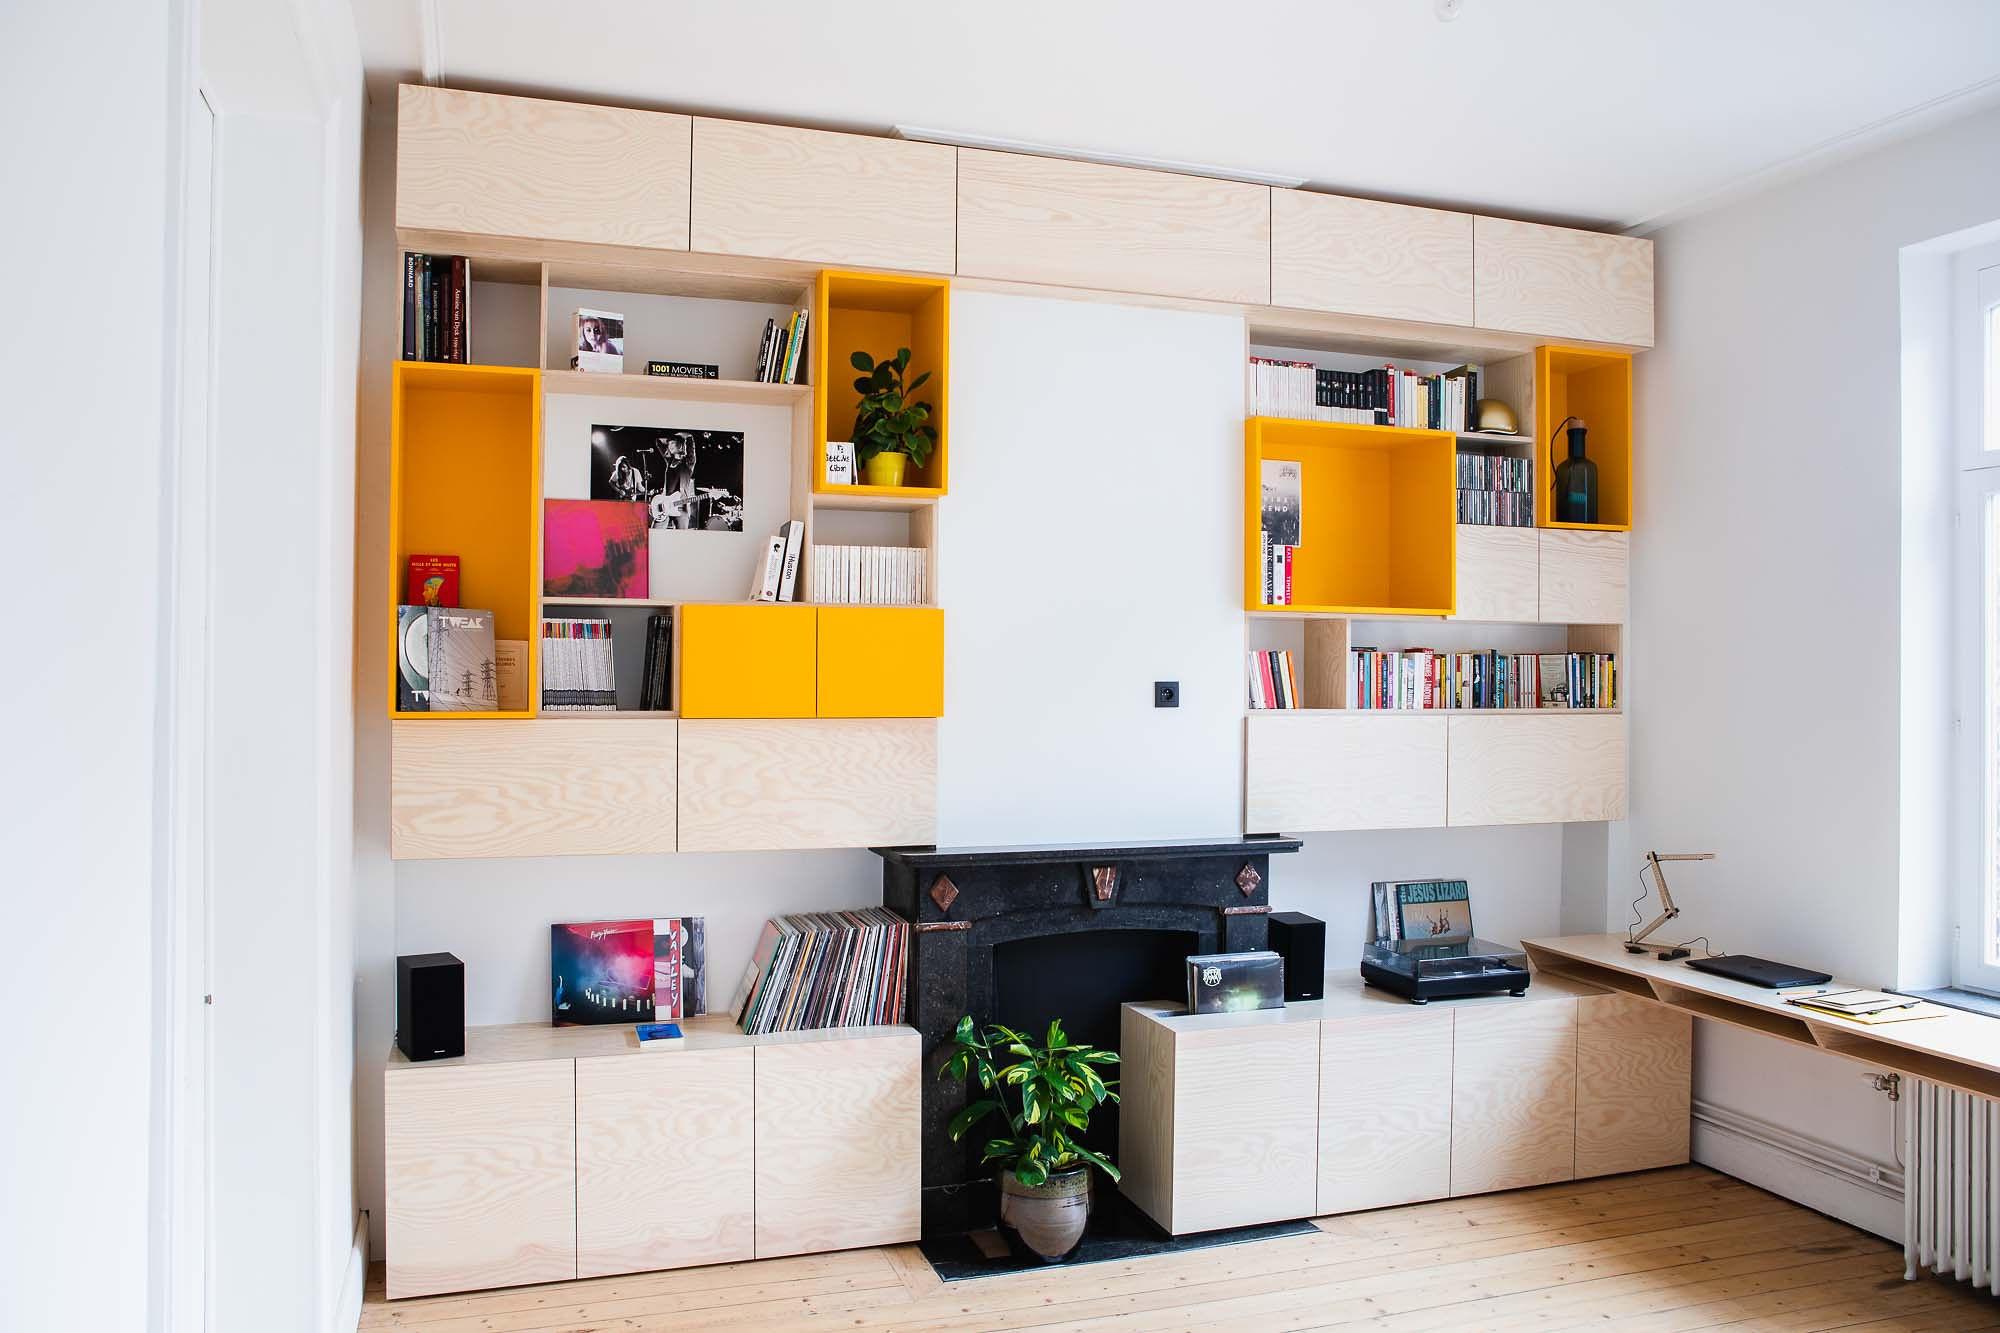 De mooie boekenkast, Idrisse Hidara